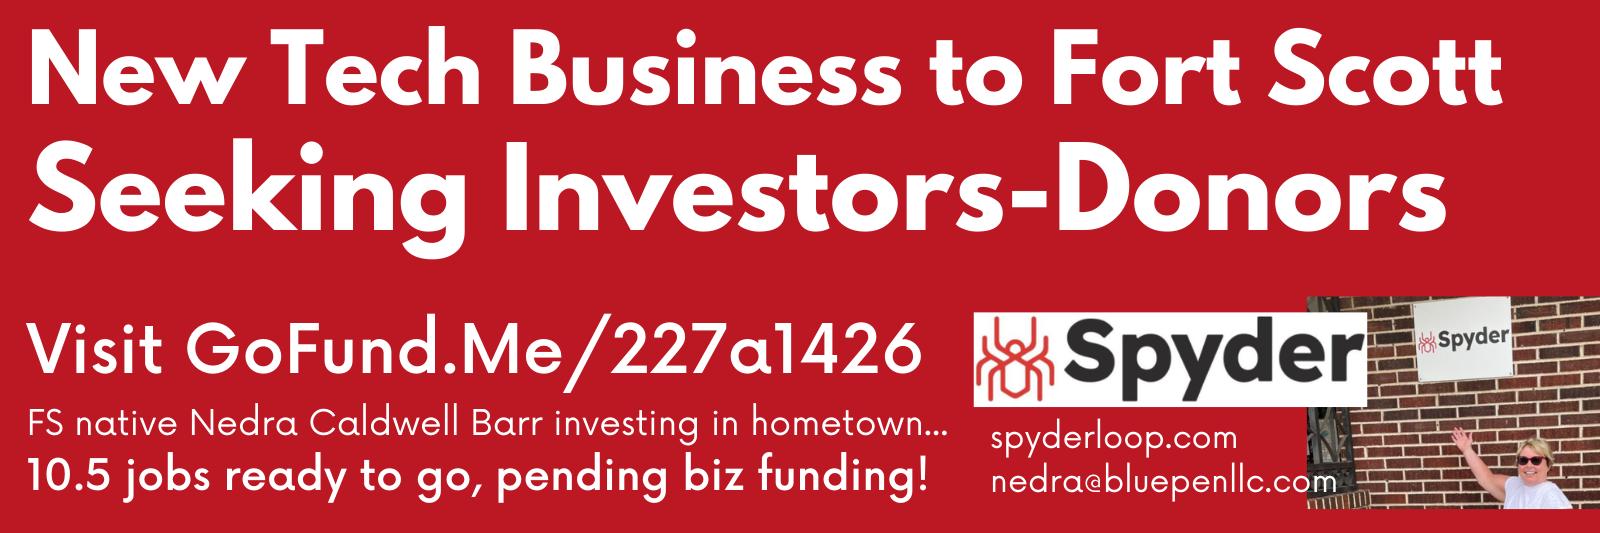 Spyder-Seeking-Investors-Donors-(1).png